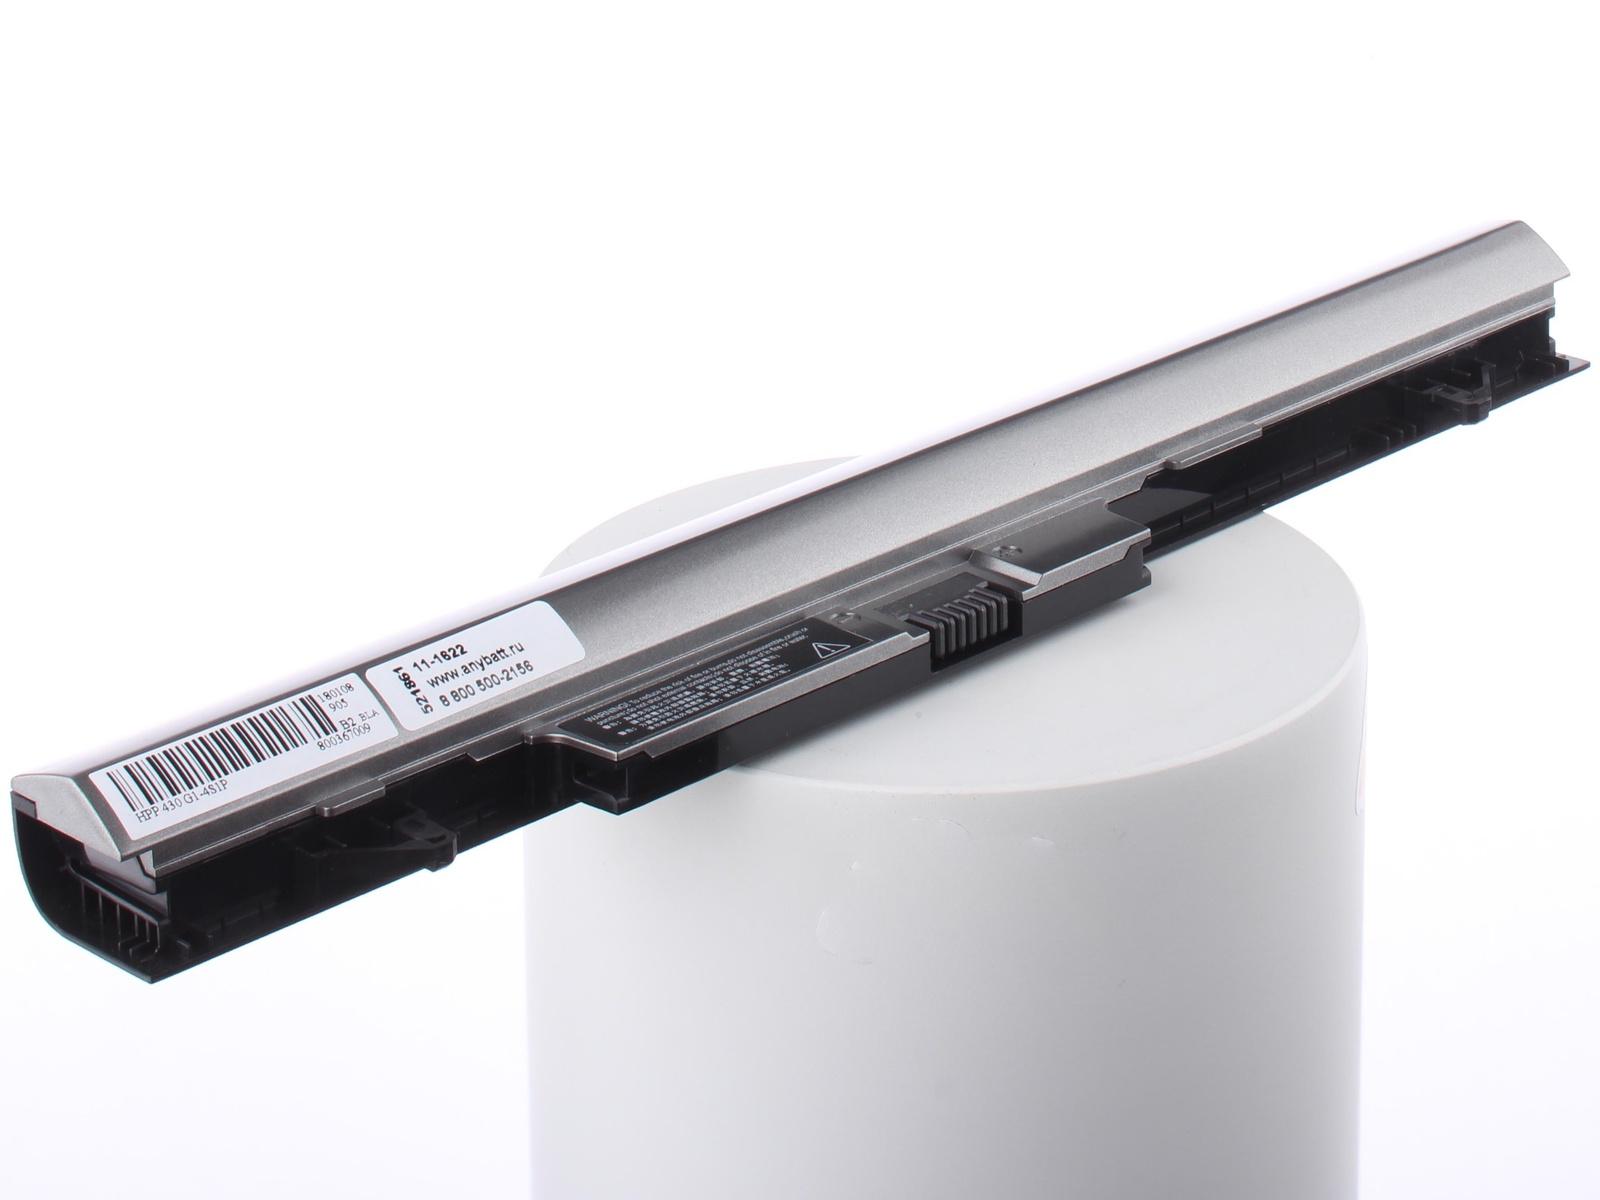 Аккумуляторная батарея AnyBatt 11-A1-1622 2200mAh для ноутбуков HP-Compaq RA04, H6L28AA, 707618-121, windows 7 для ноутбуков hp